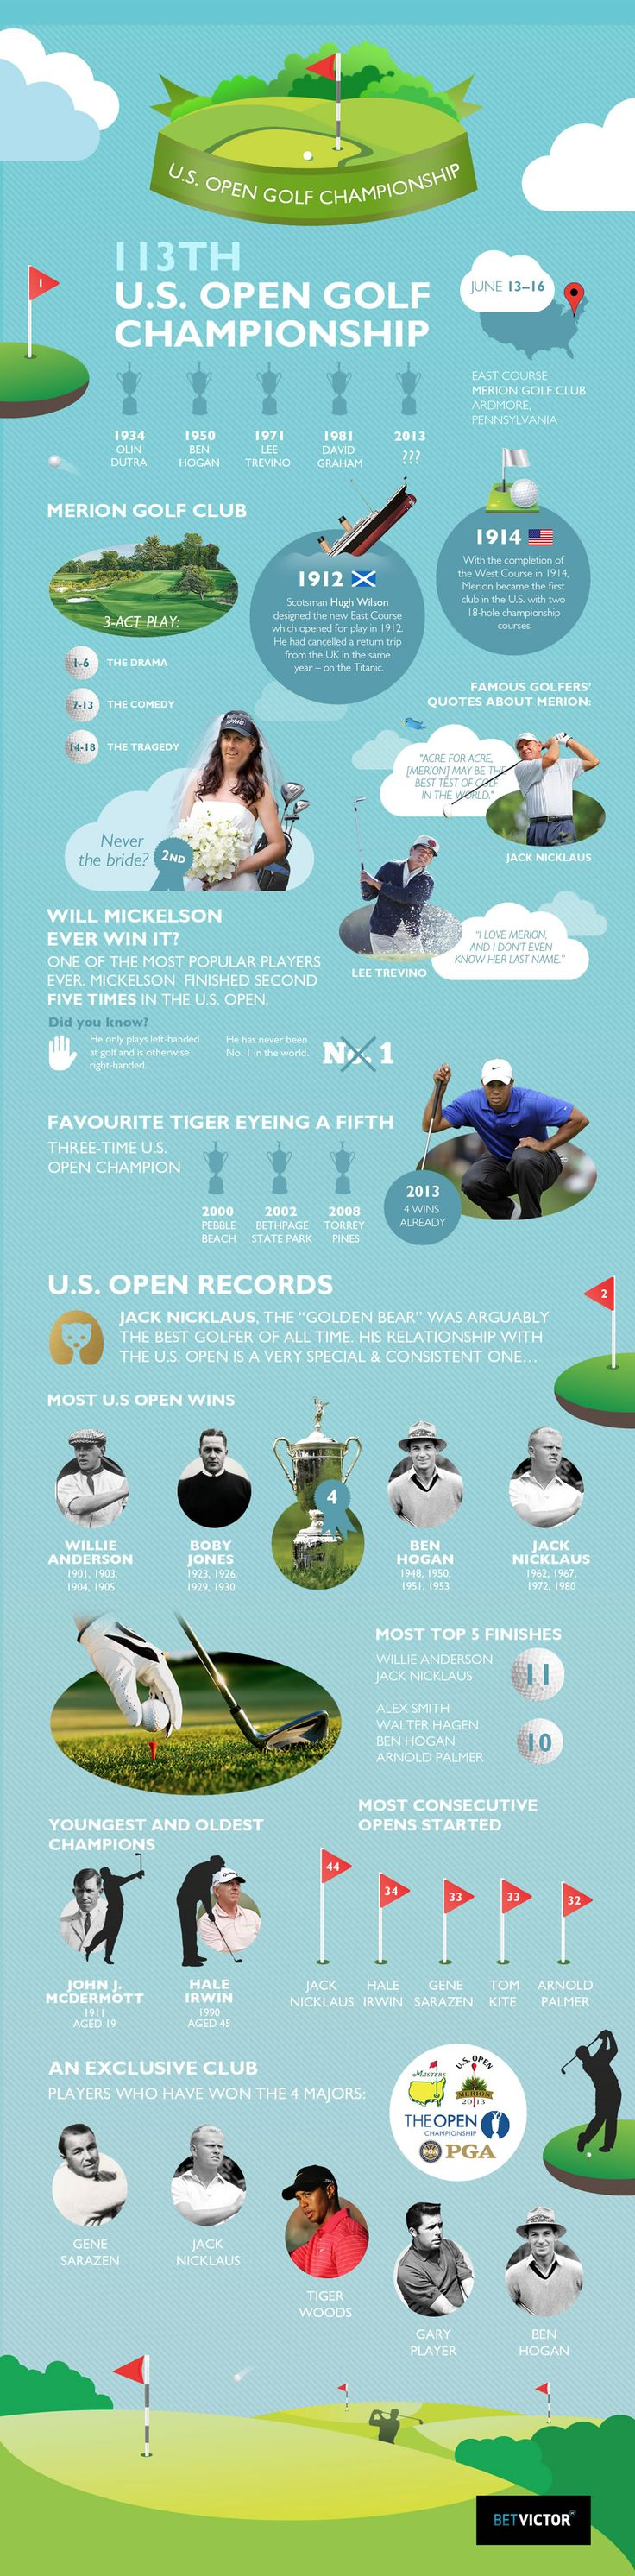 us-open-golf-championship